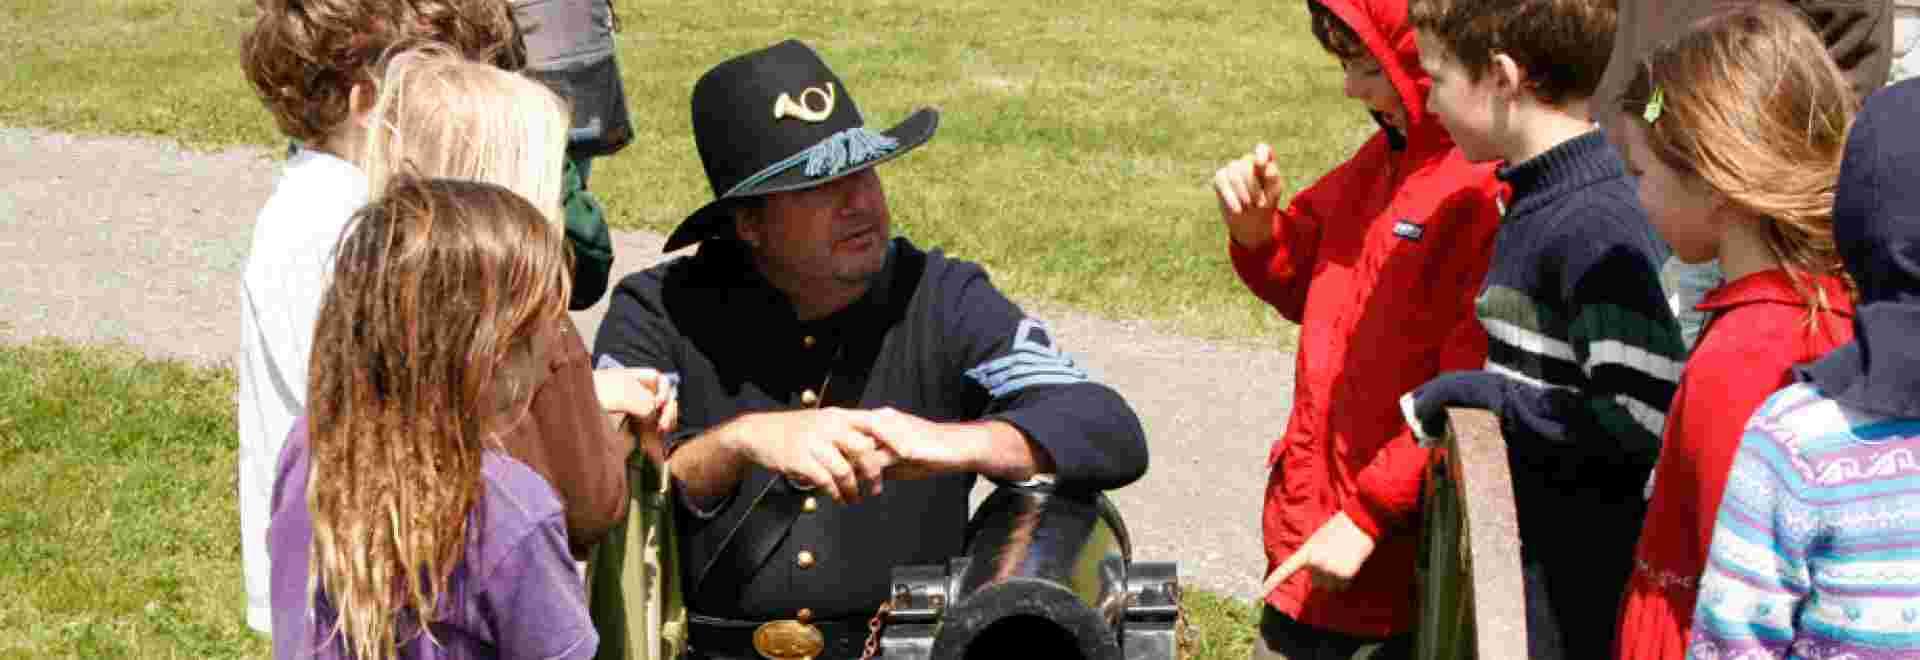 Living history demonstration performed at Fort Humboldt State Historic Park